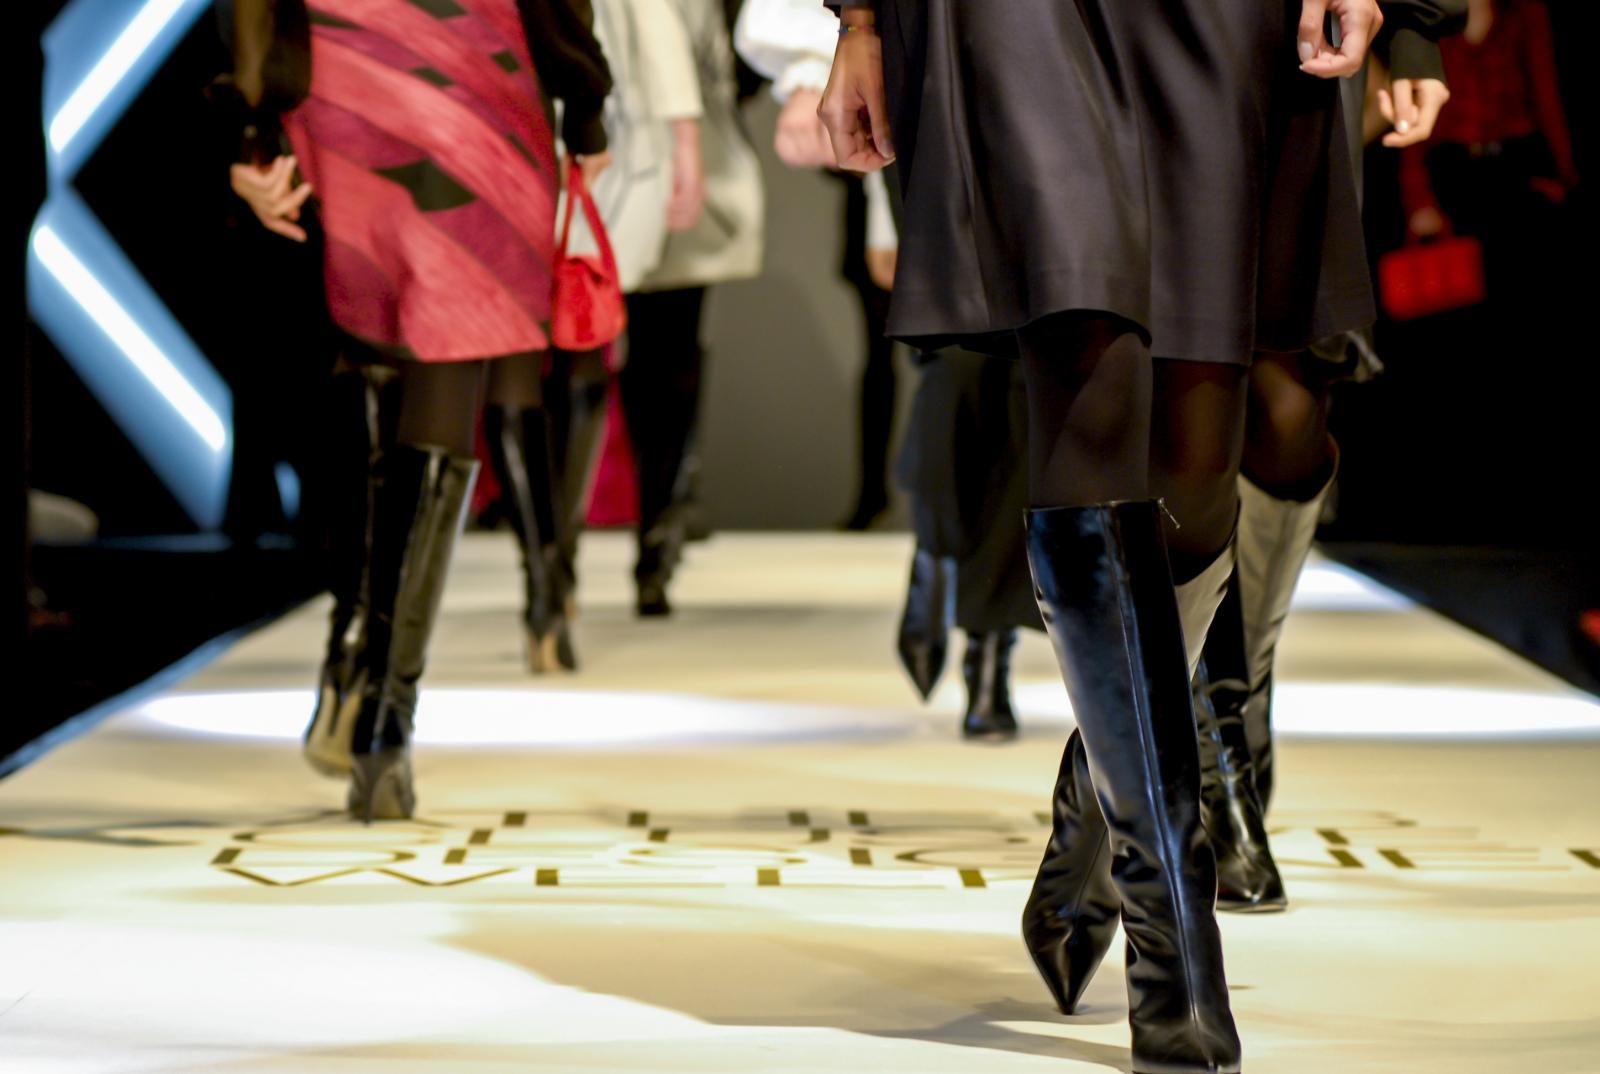 Models walking on a runway. Photo courtesy araelf/Fotolia.